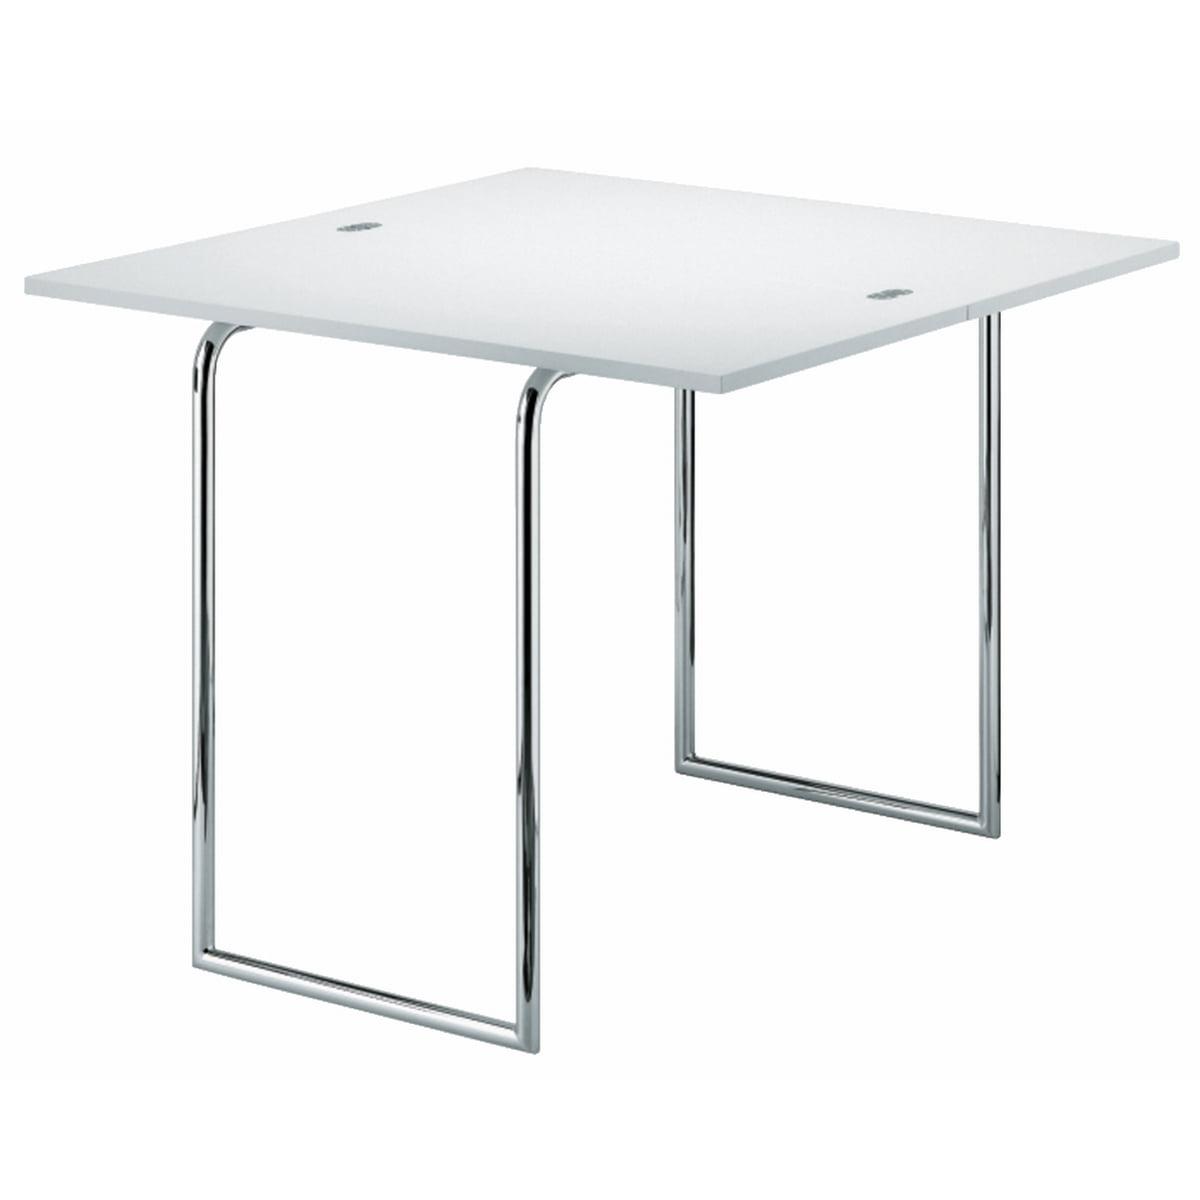 B 109 Folding Table By Thonet